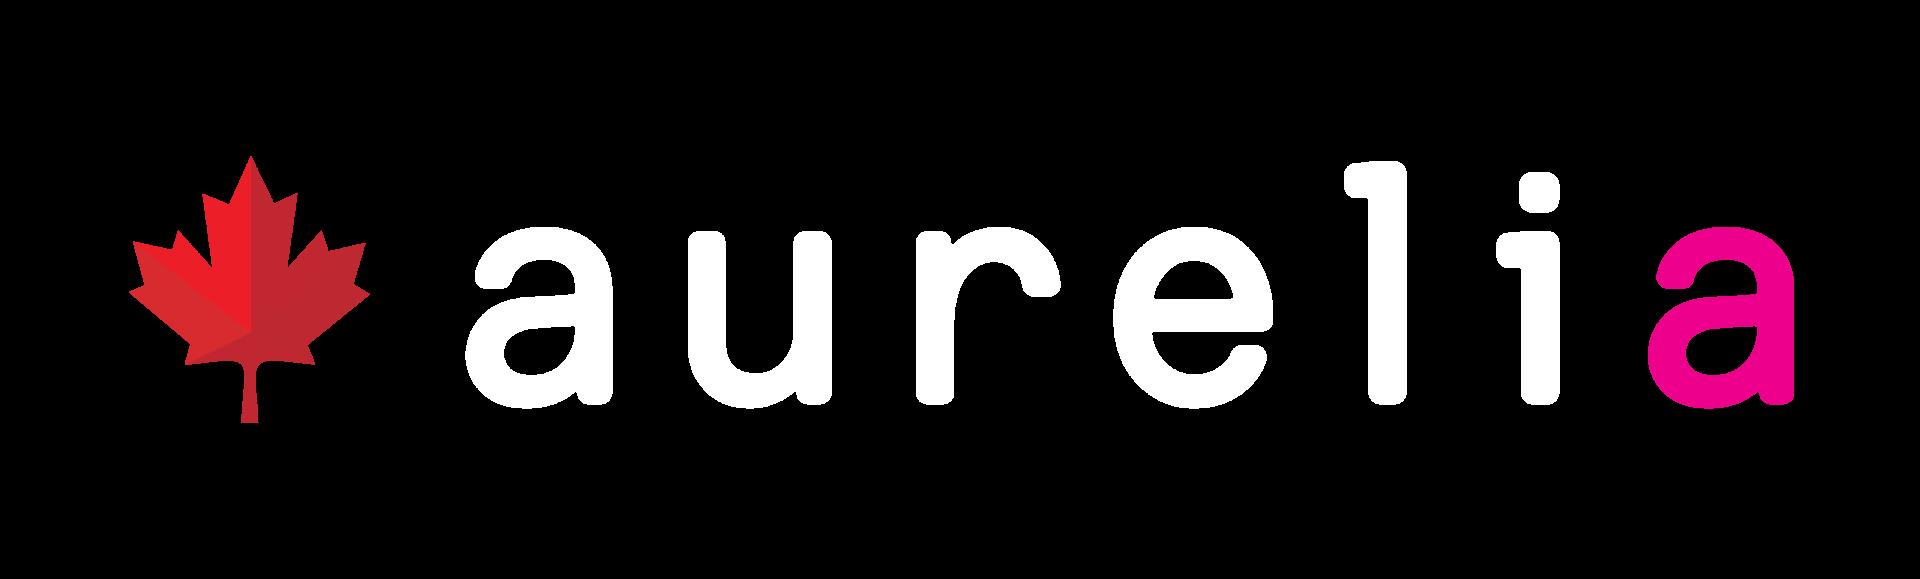 Aurelia-Maple-Leaf-Logo-white-pink